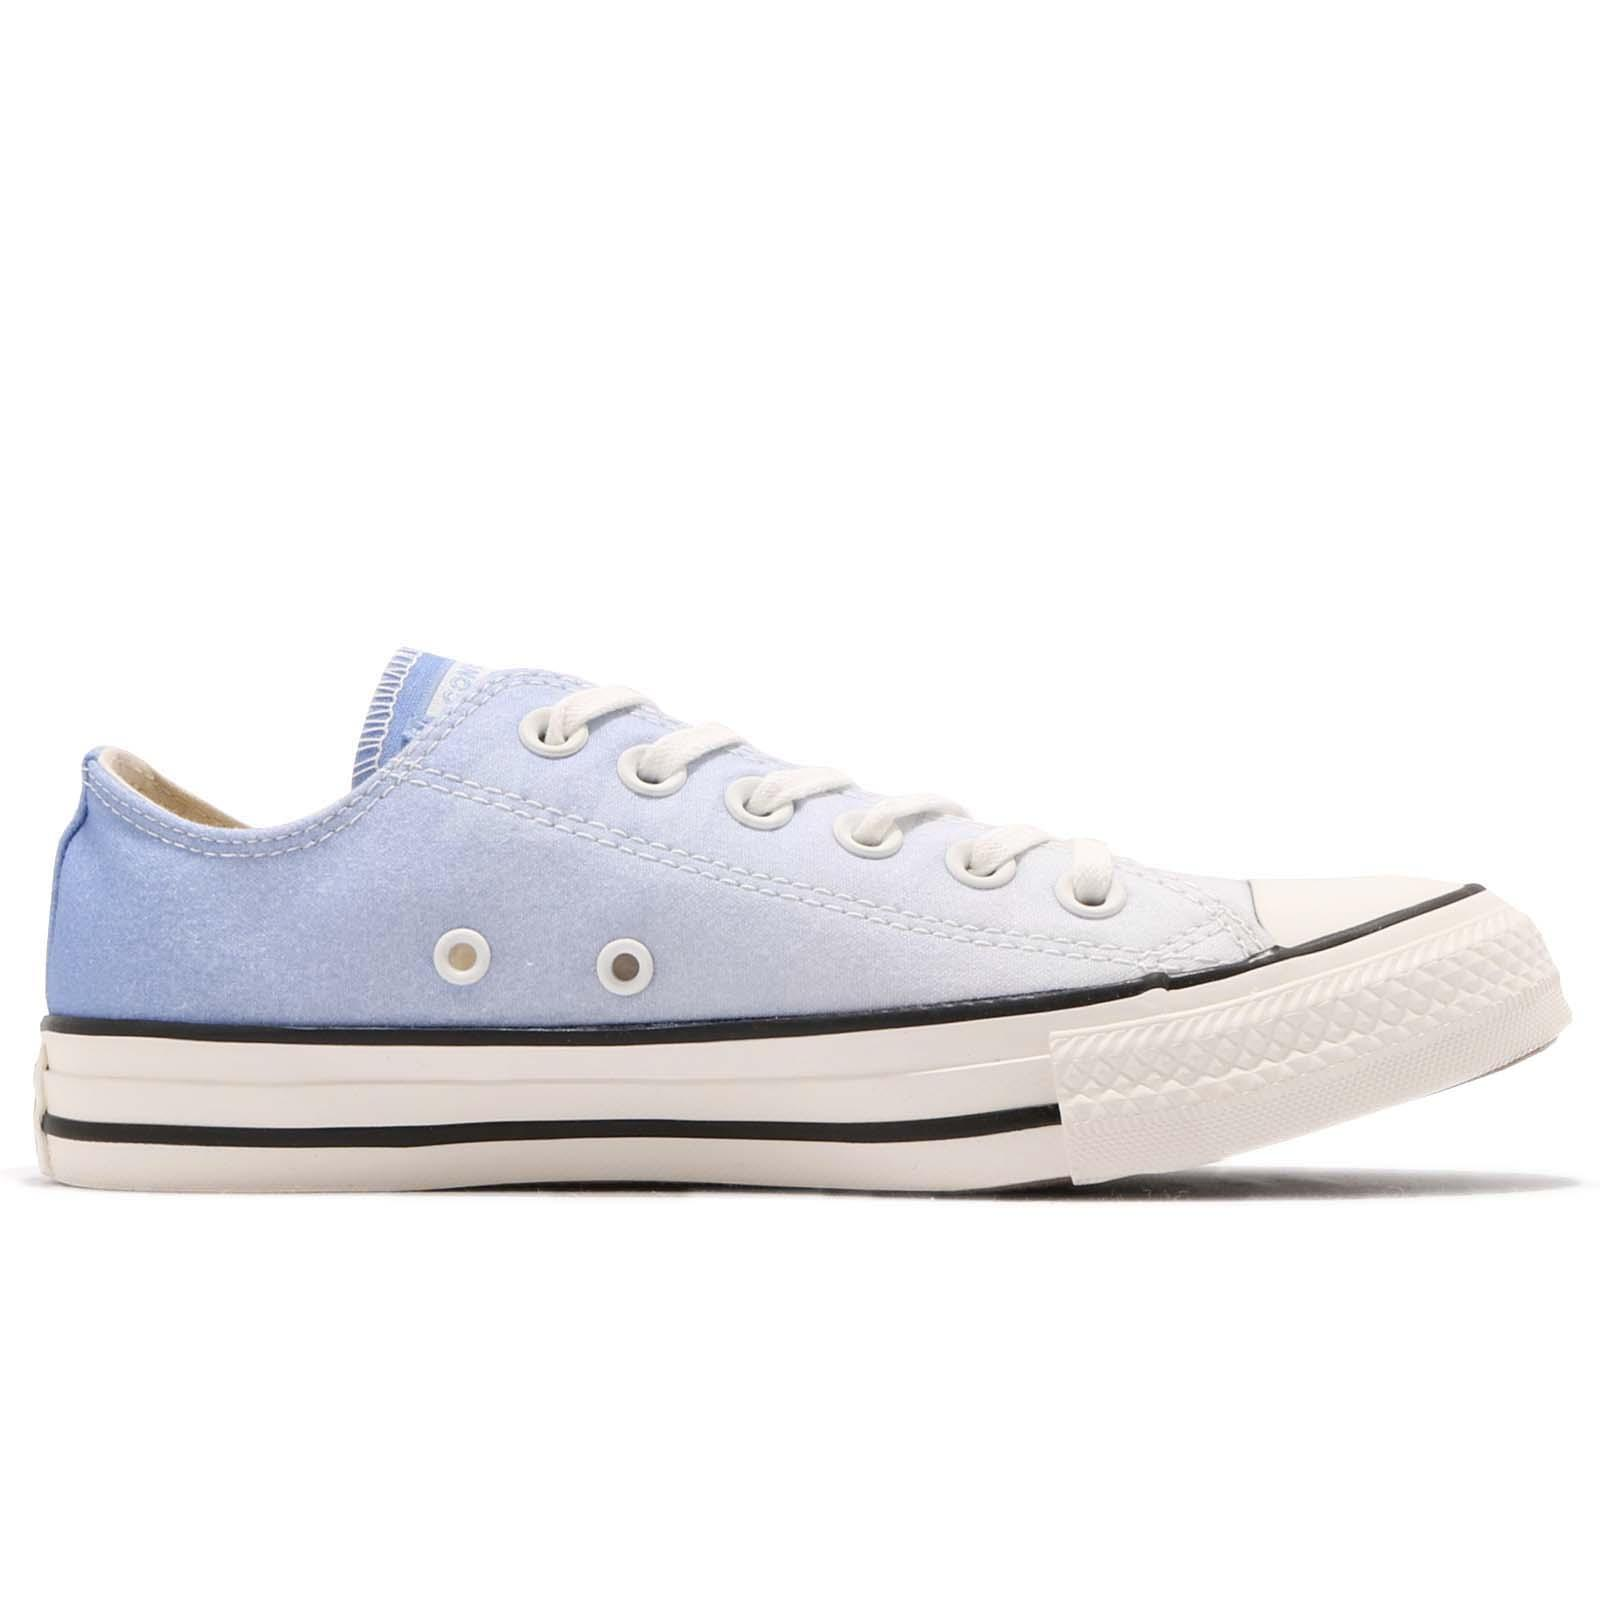 c91bec4370513 Converse Chuck Taylor All Star OX White Blue Black Women Casual ...